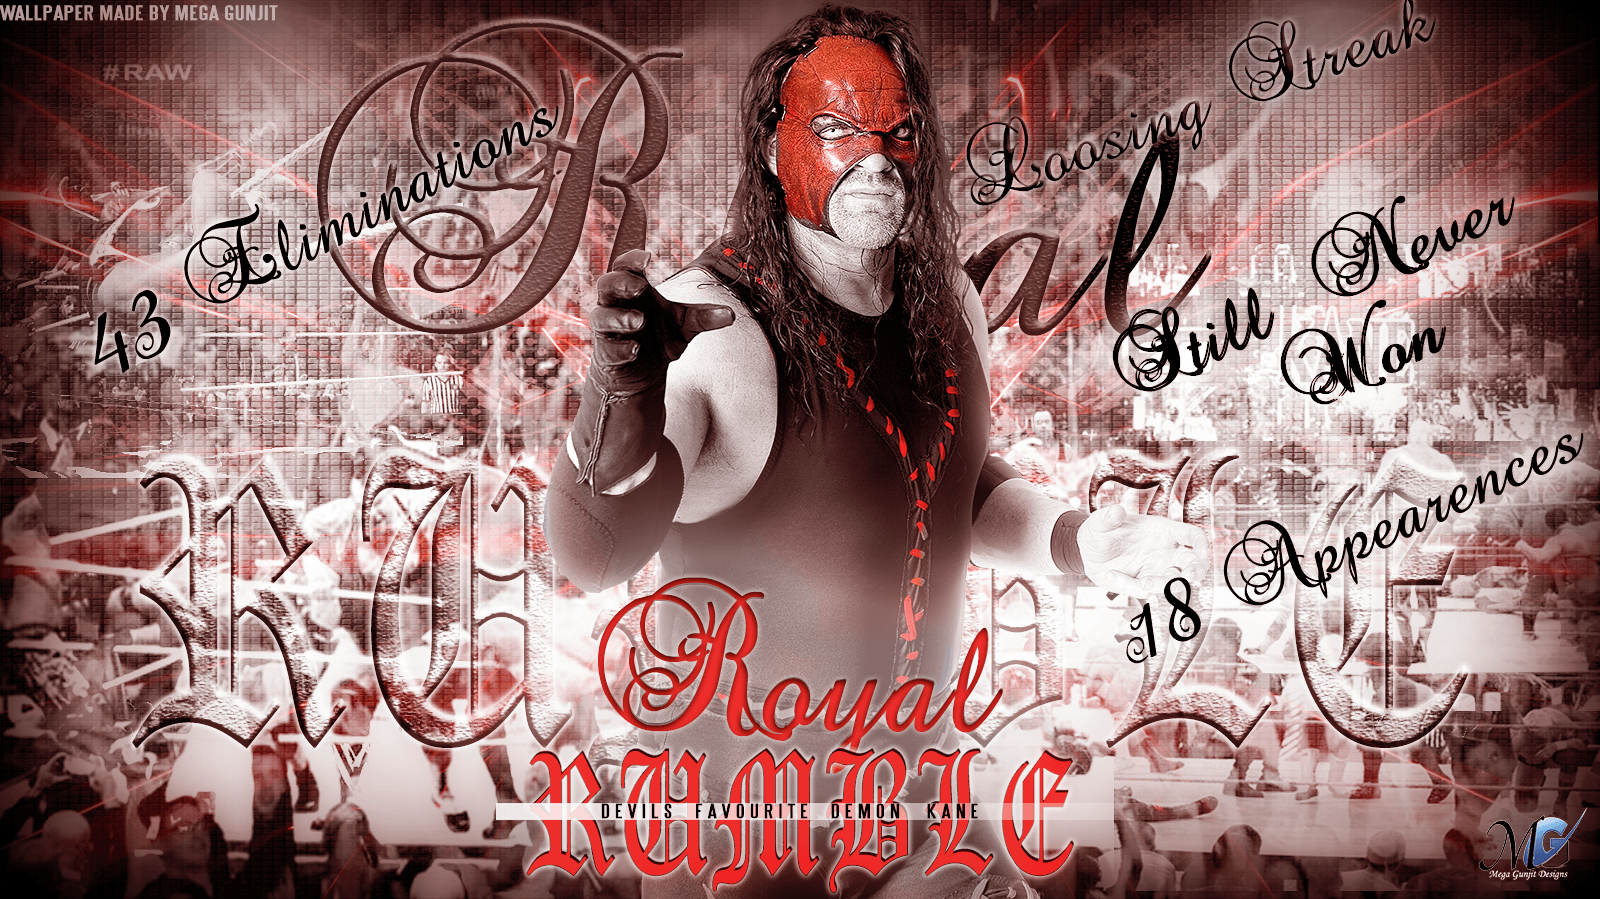 WWE HD Wallpapers - Kane Royal Rumble Tribute 2 by Megagunjit on ...